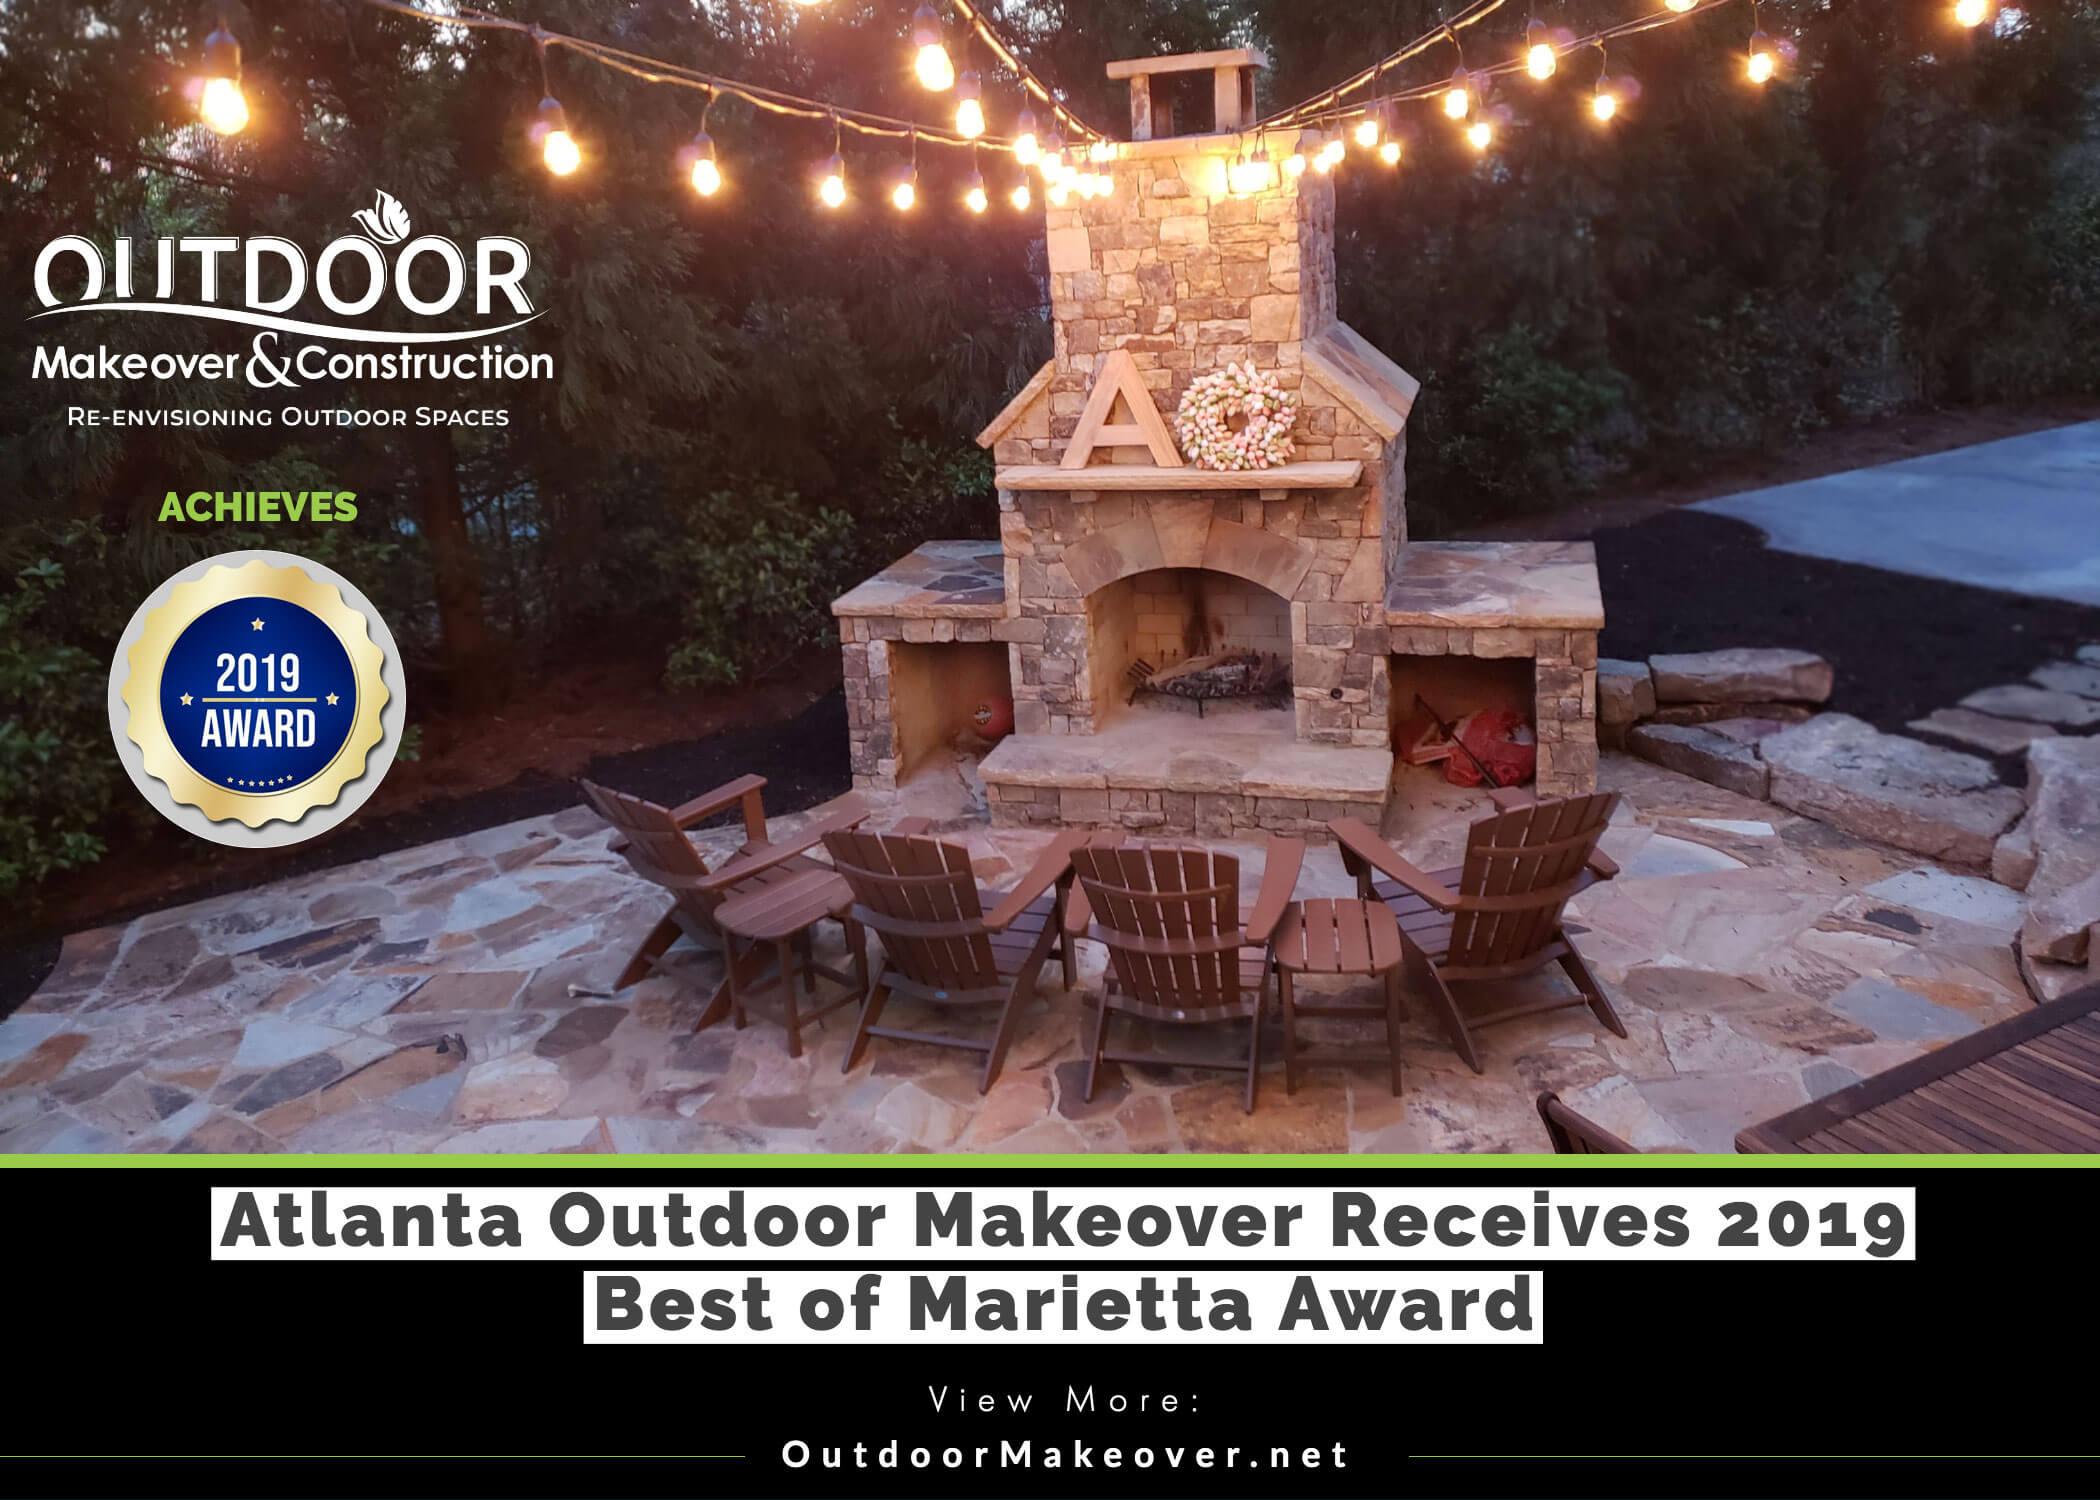 2019 Best of Marietta Award for Outdoor Makeover & Construction